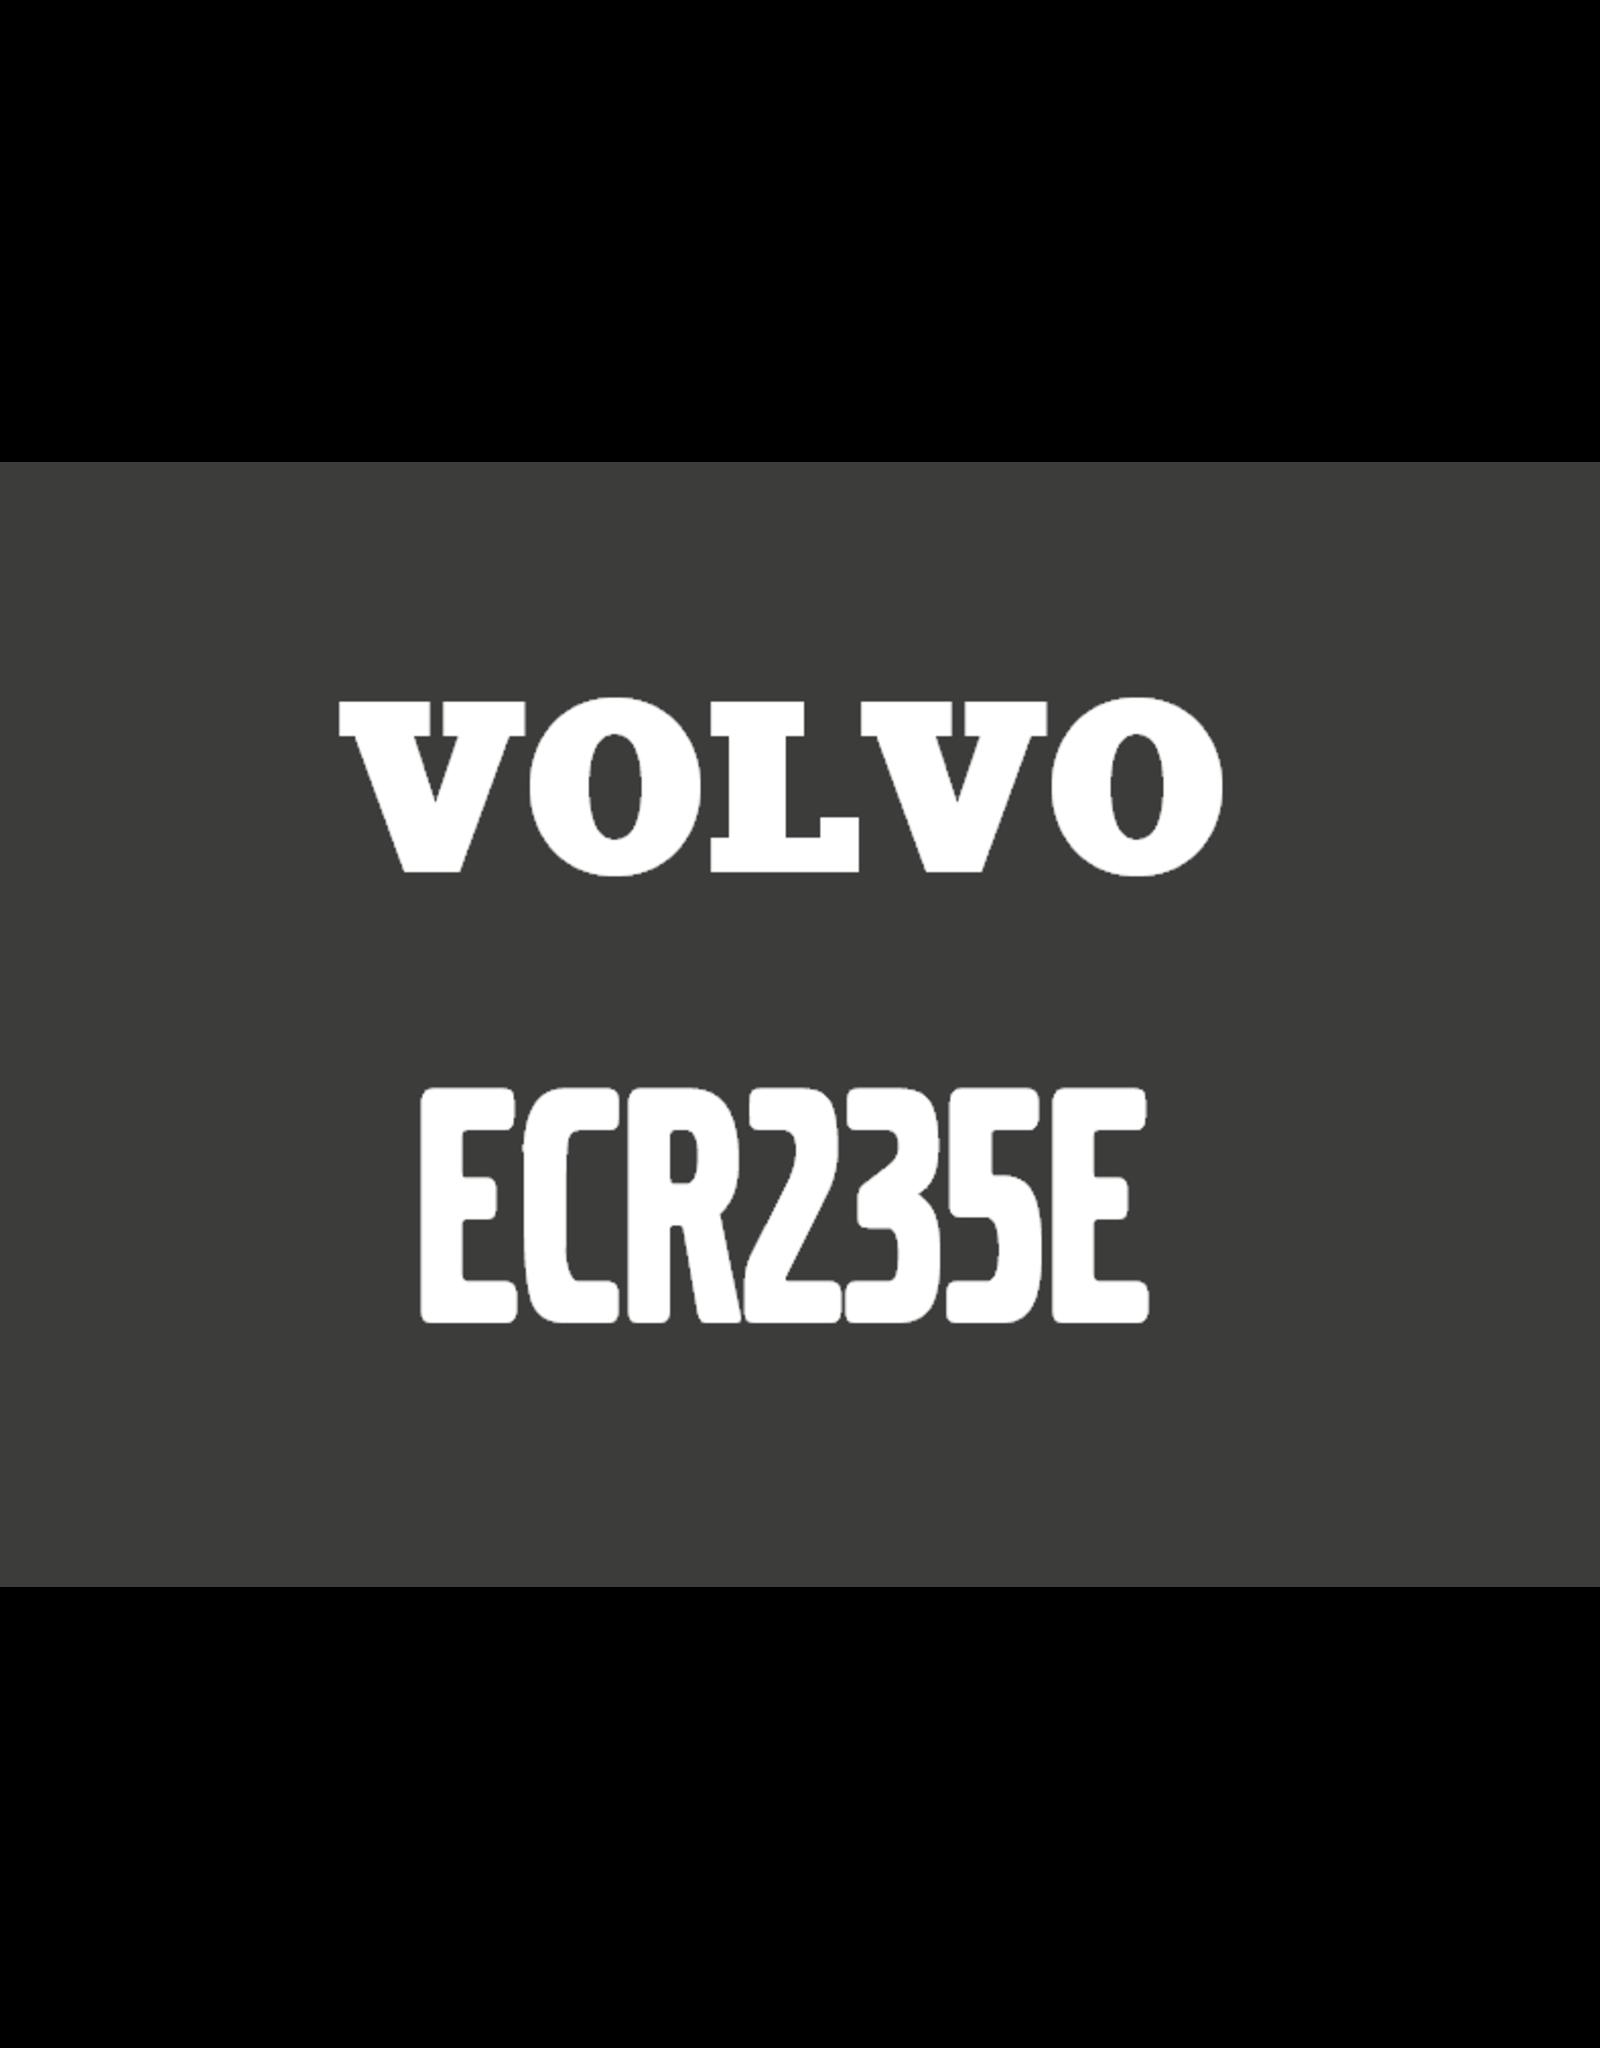 Echle Hartstahl GmbH FOPS für Volvo ECR235E